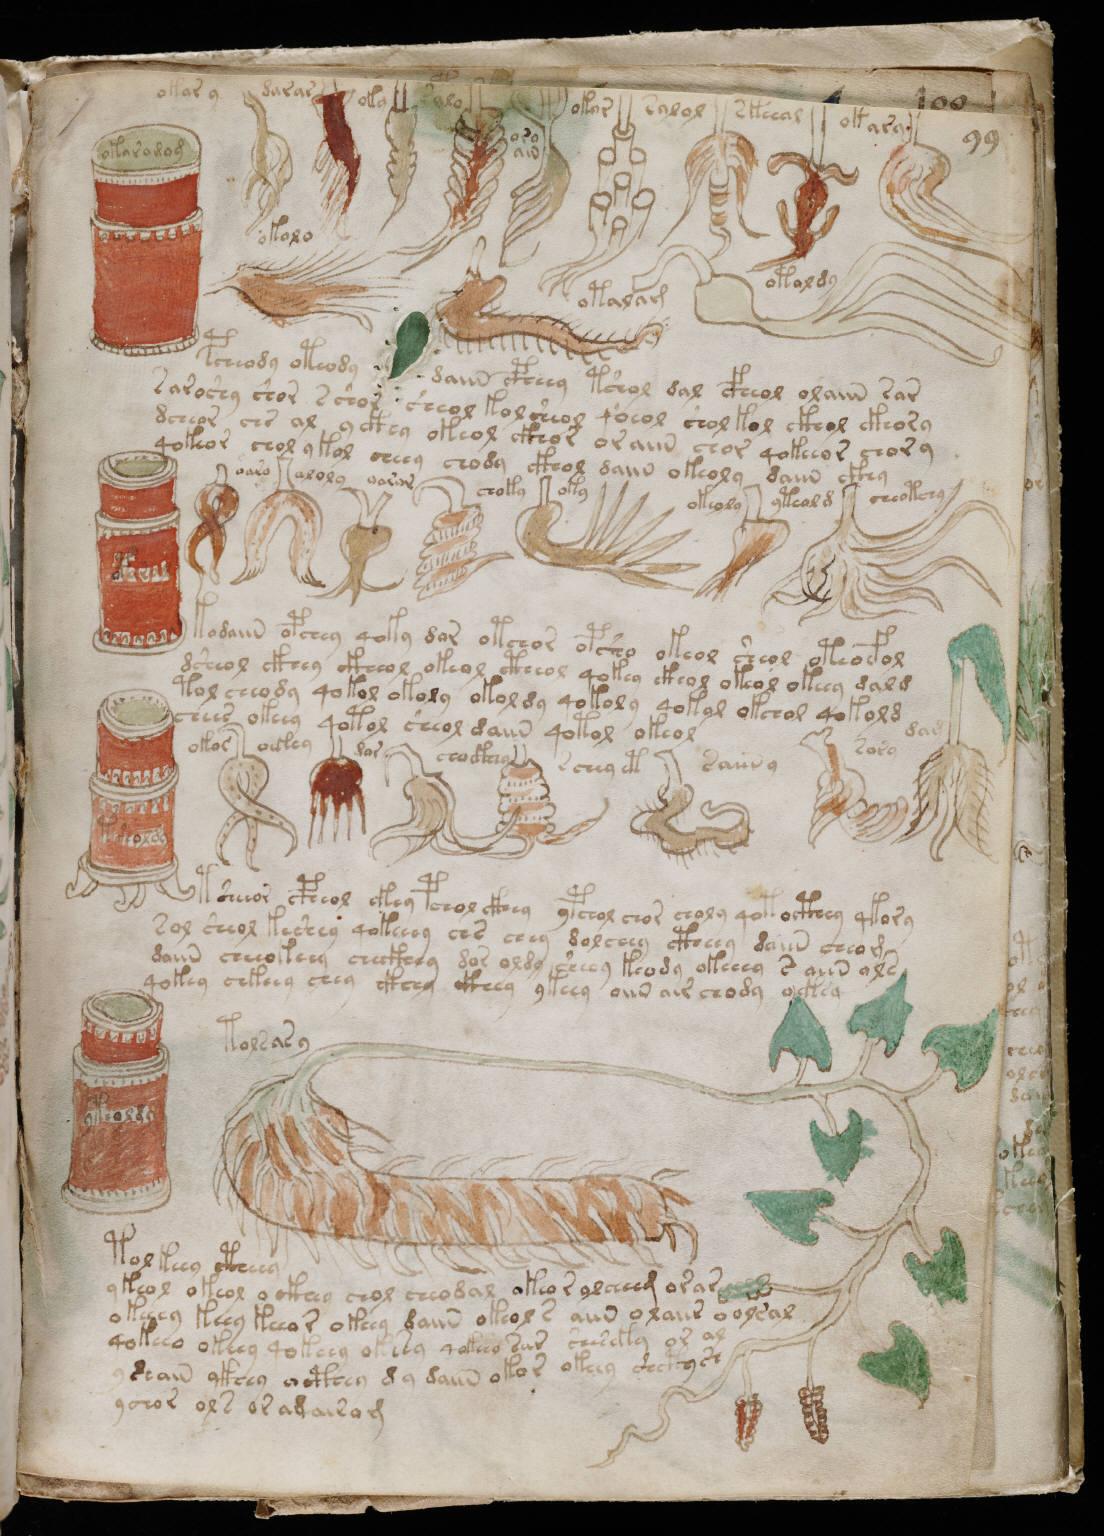 Voynich Manuscript %28175%29 ヴォイニッチ手稿(写本) どの言語にも属さない謎の文字!